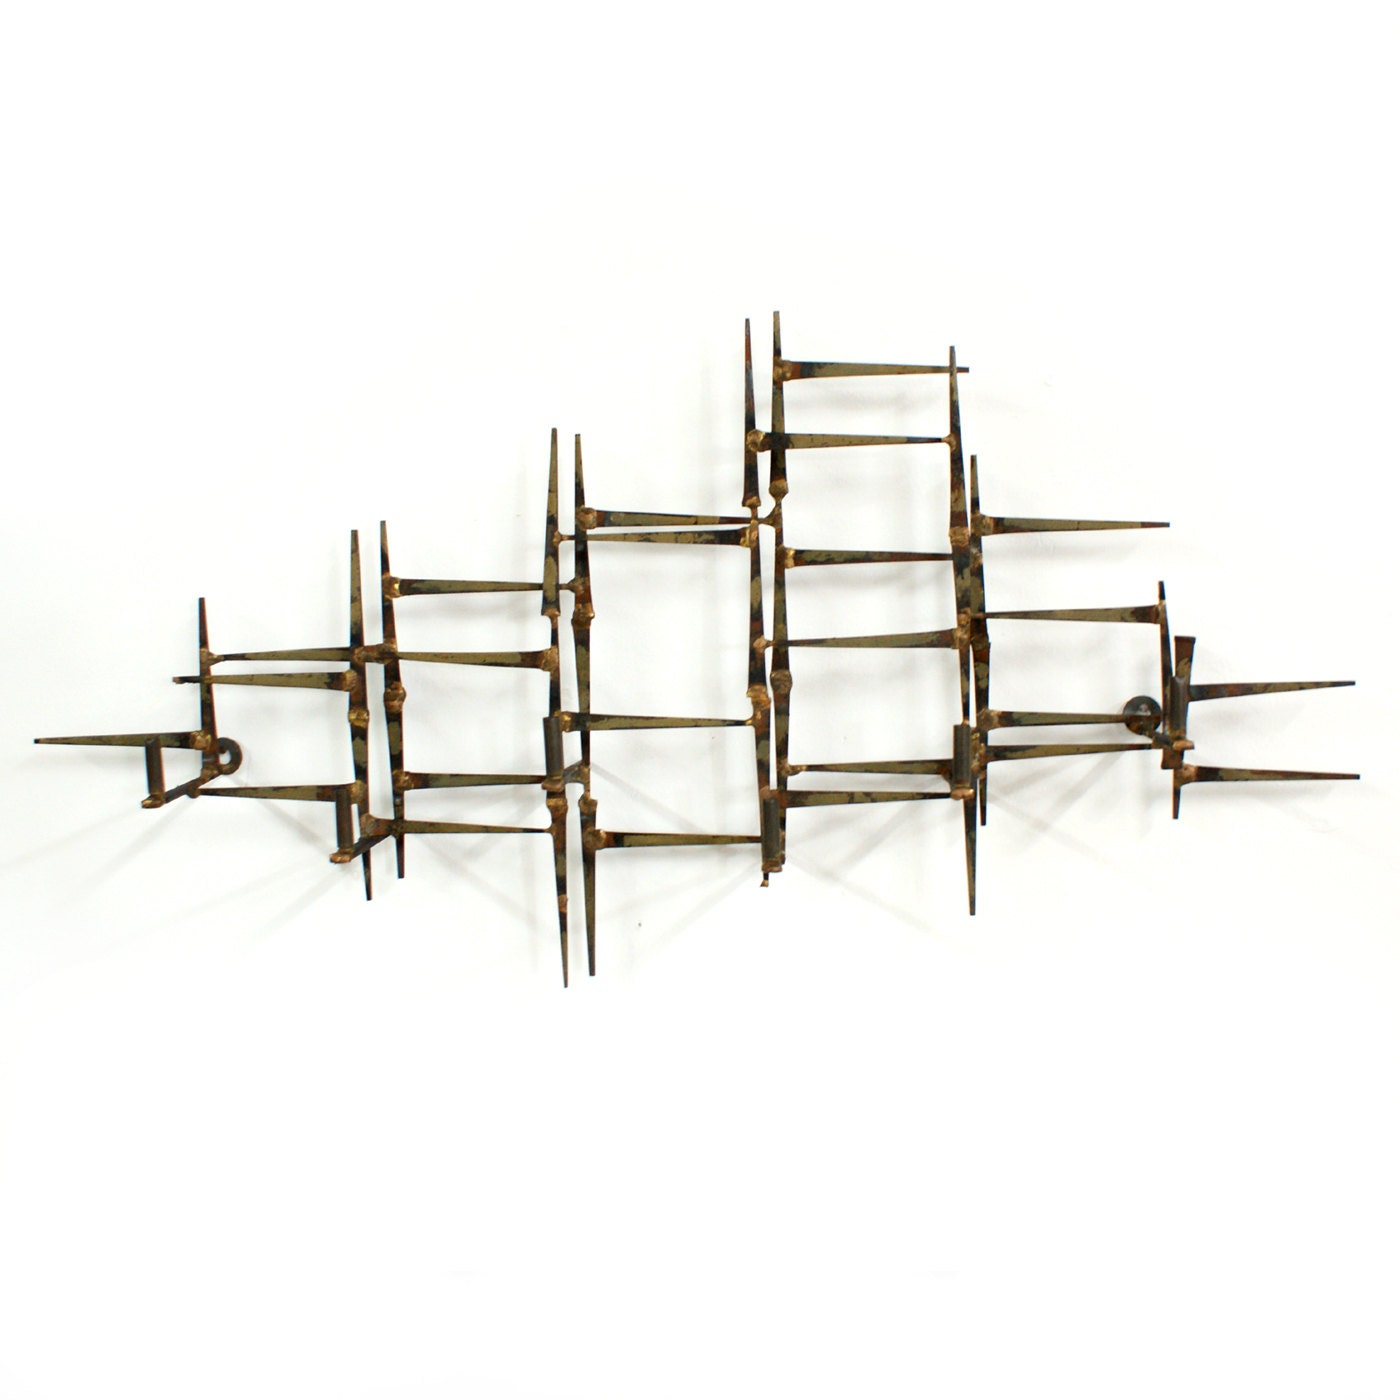 brutalist abstract metal wall sculpture mid century modern. Black Bedroom Furniture Sets. Home Design Ideas